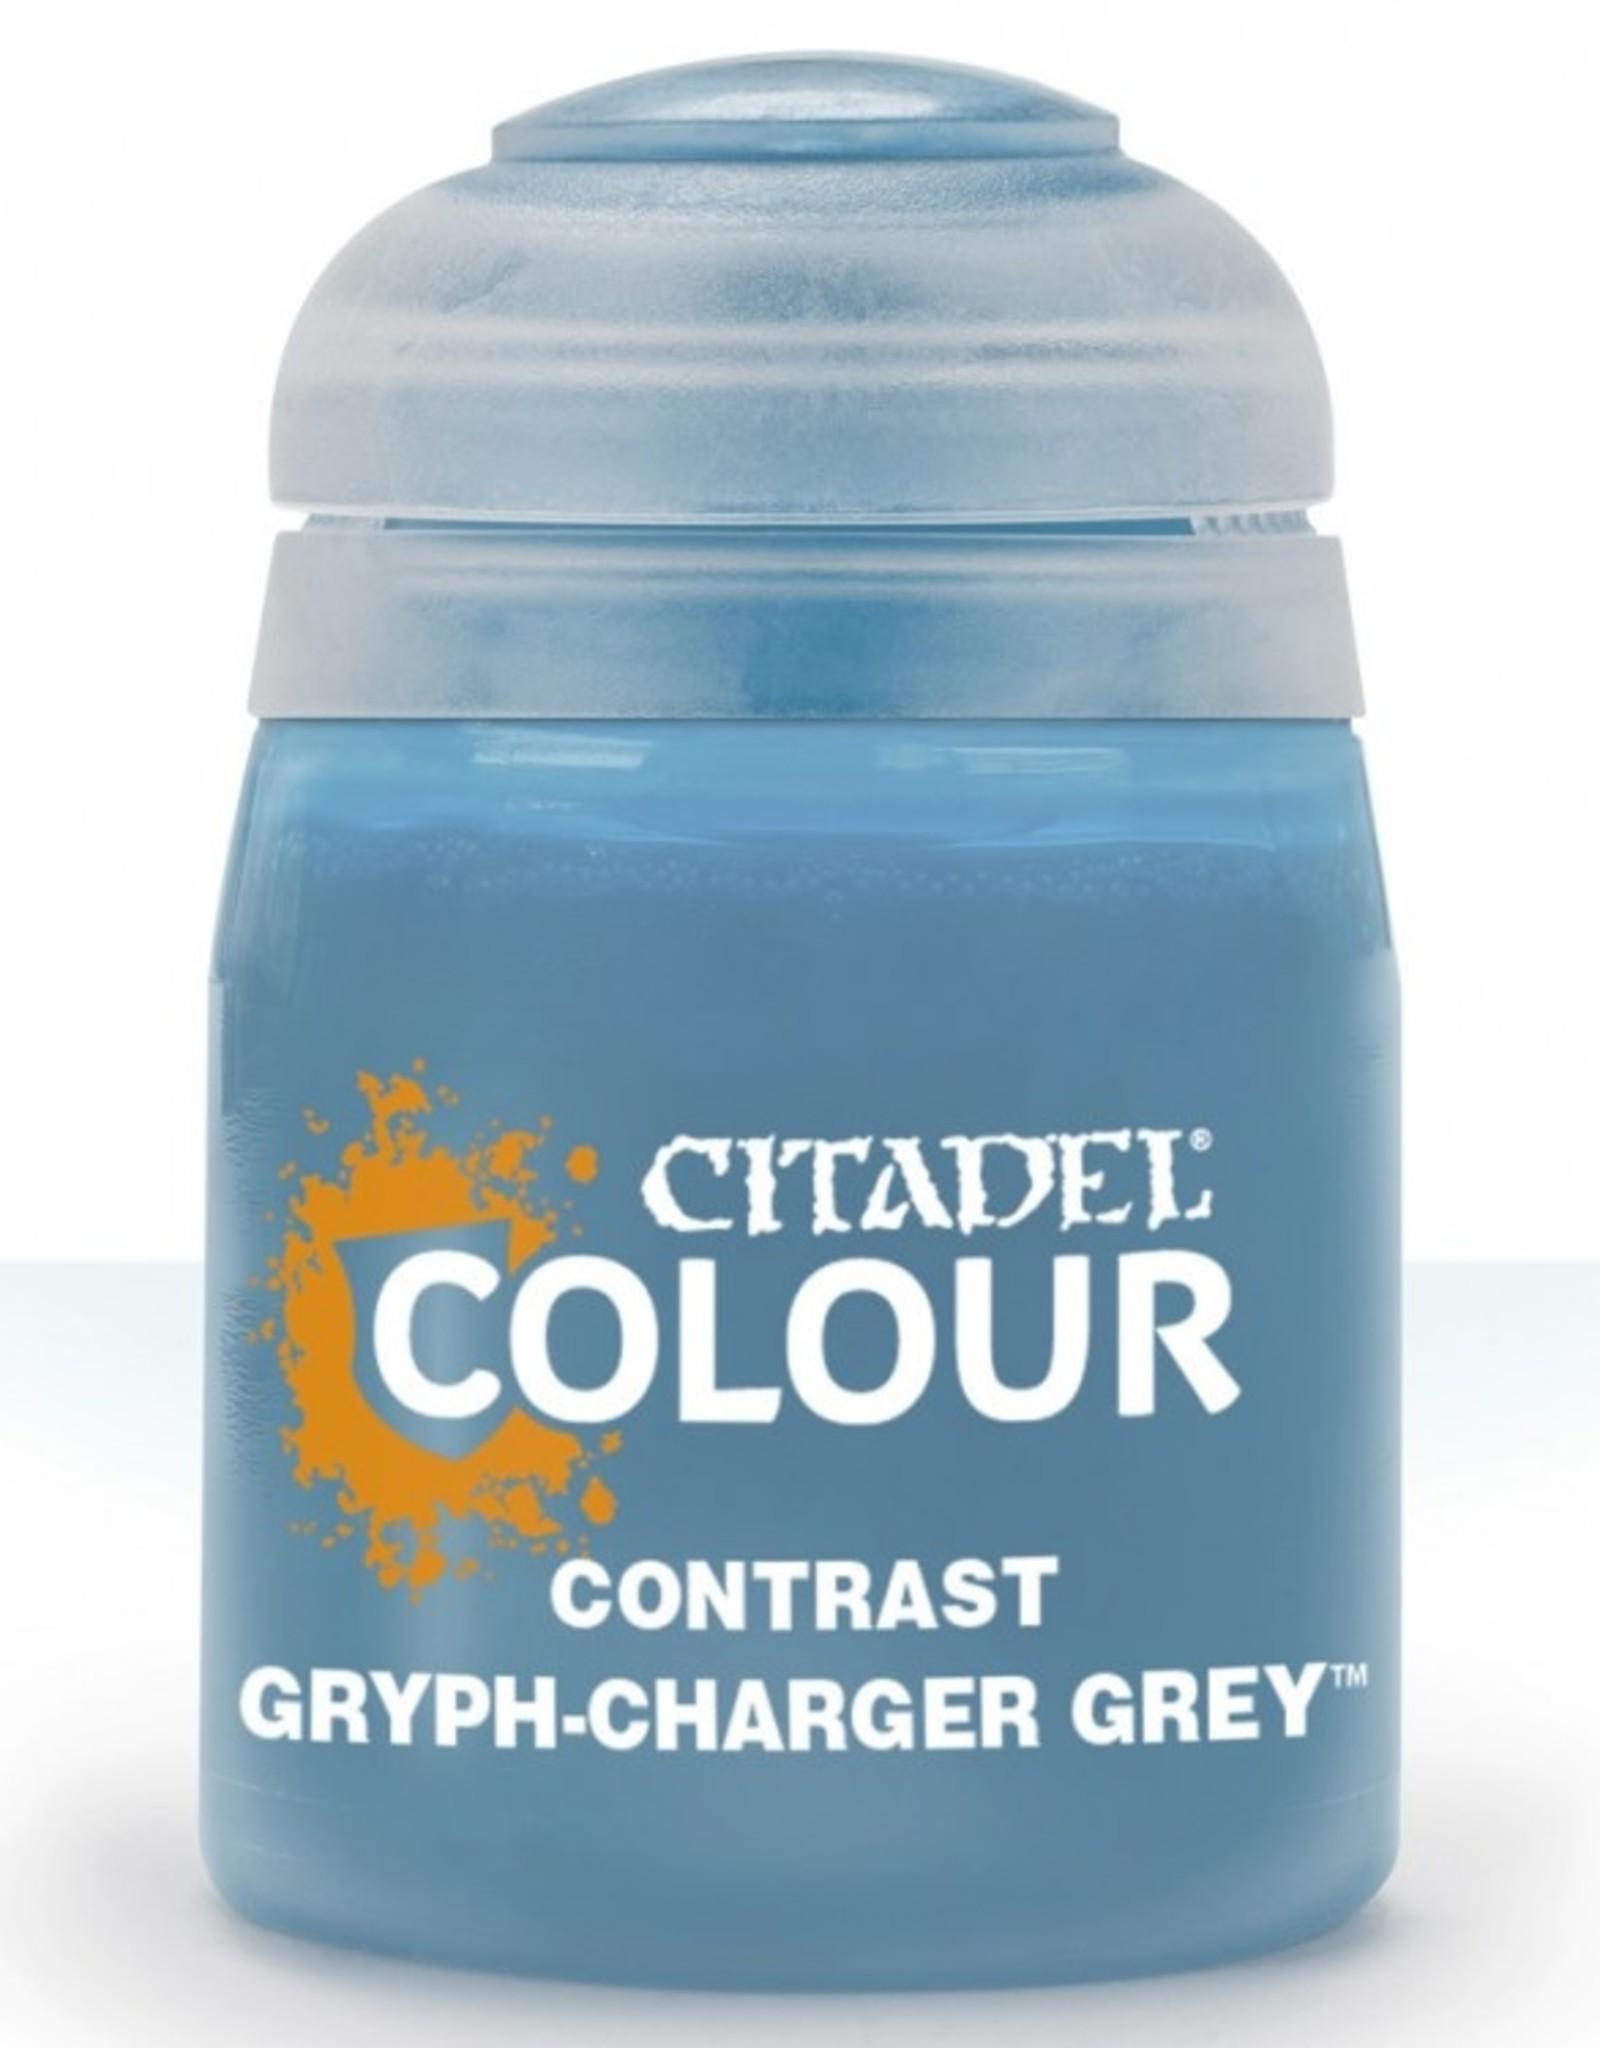 Games Workshop (Citadel) - Contrast: Gryph-Charger Grey